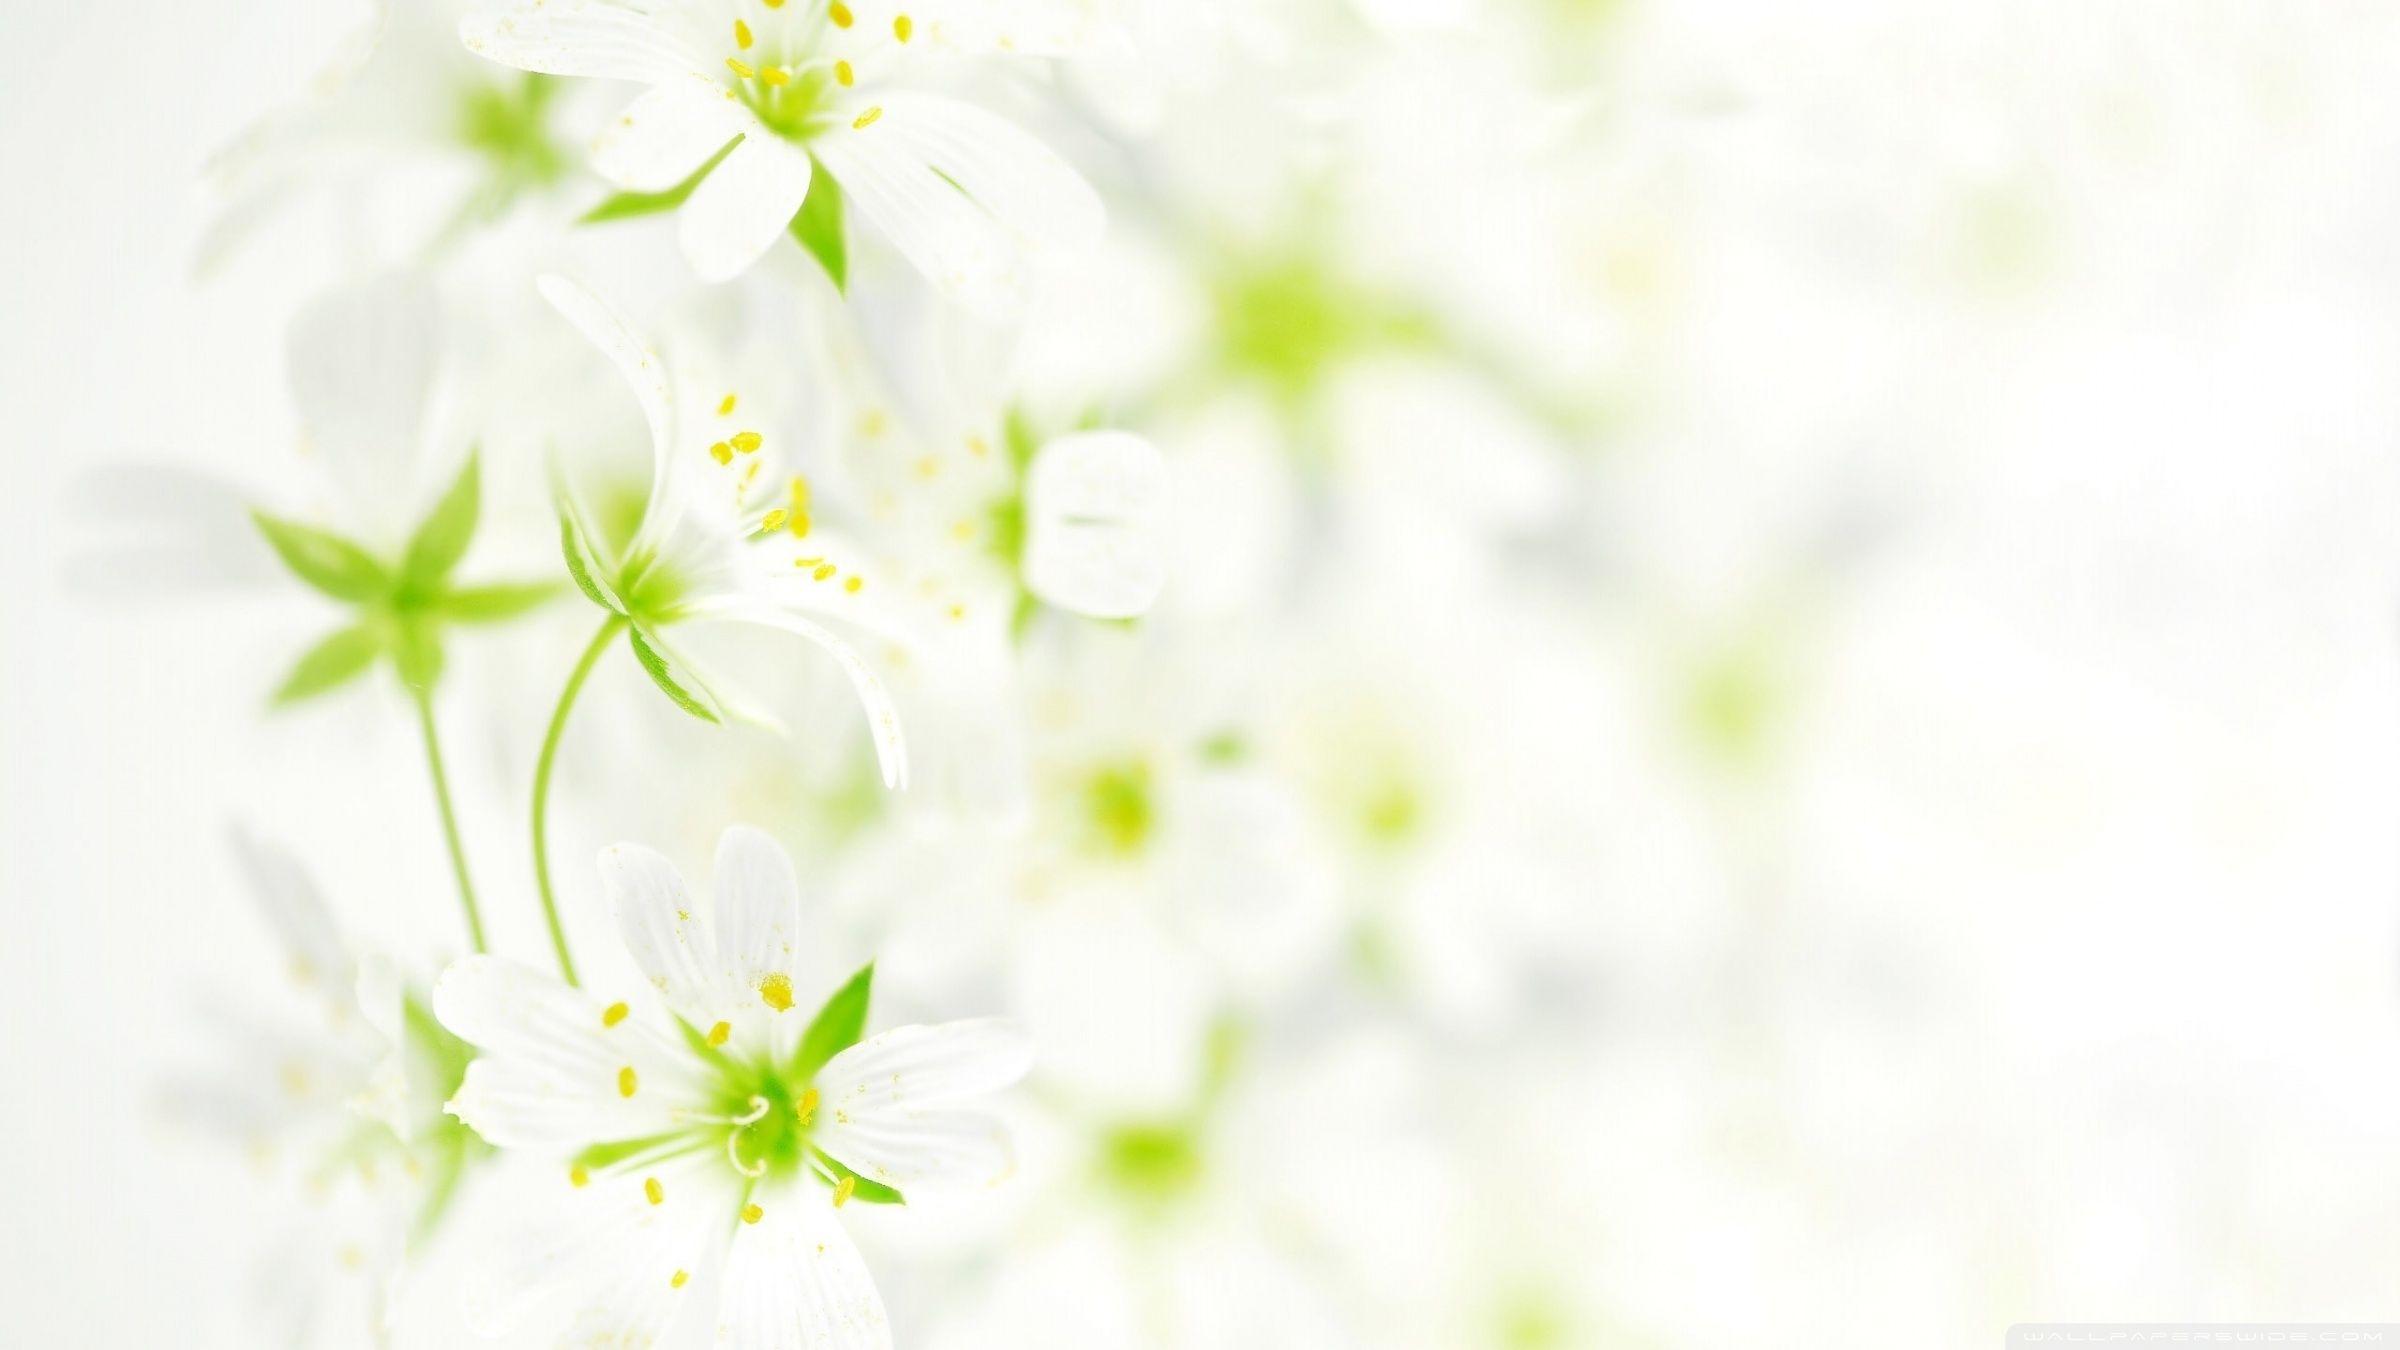 Best Ideas About White Flower Wallpaper On Pinterest Fl